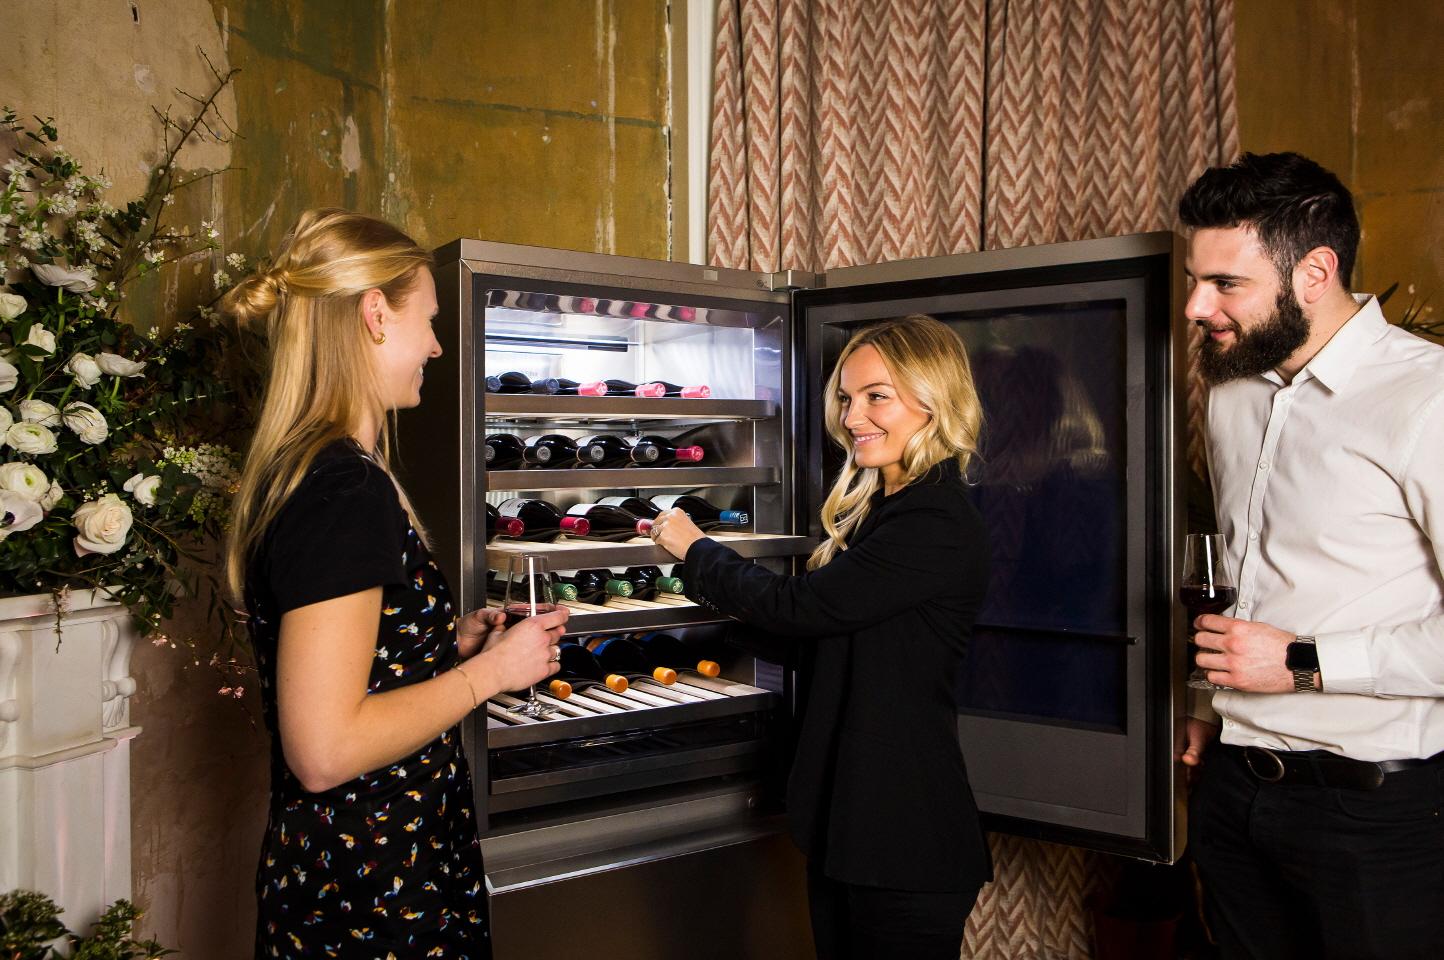 LG전자가 6일 현지시간 6일 영국 런던에 위치한 이벤트홀인 에니스모어 세션스 하우스(Ennismore Sessions House)에서 와인 명가 코니&바로우(Corney & Barrow)와 함께 LG 시그니처 와인셀러를 선보이는 행사를 열었다.